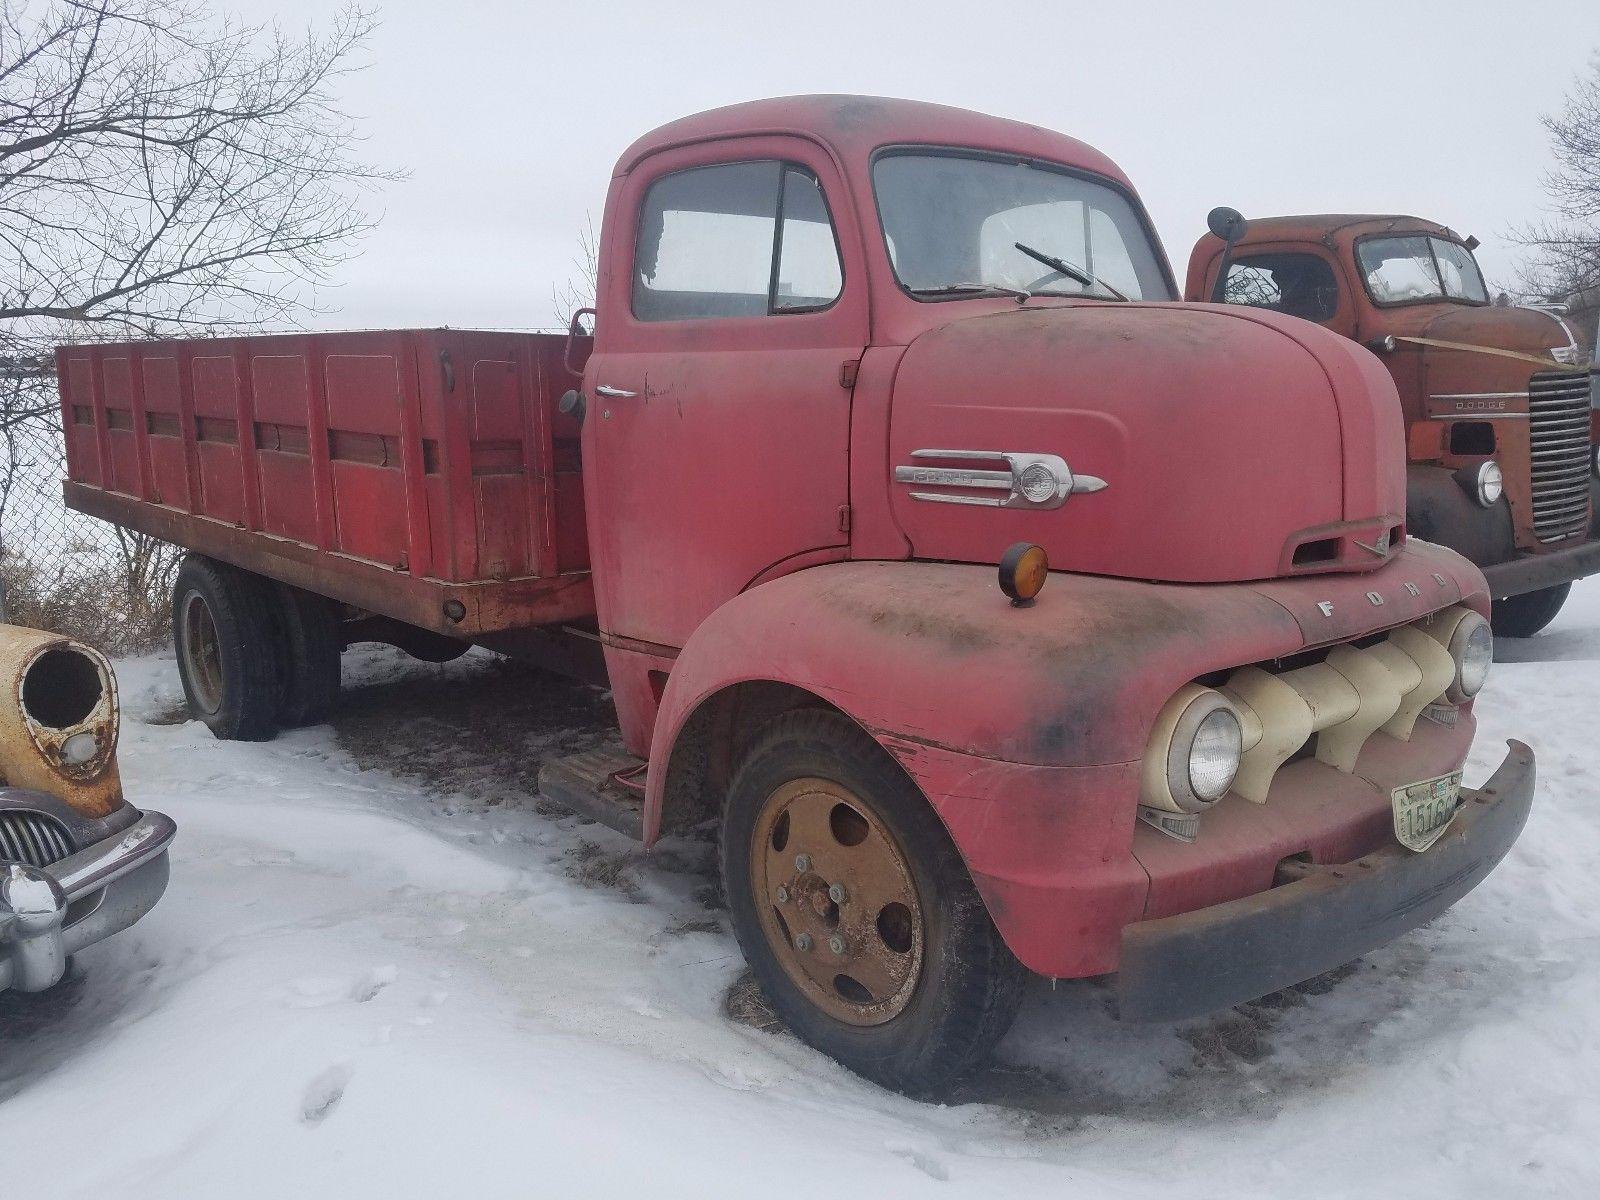 Hot Rod Hauler Potential 1952 Ford COE Trucks